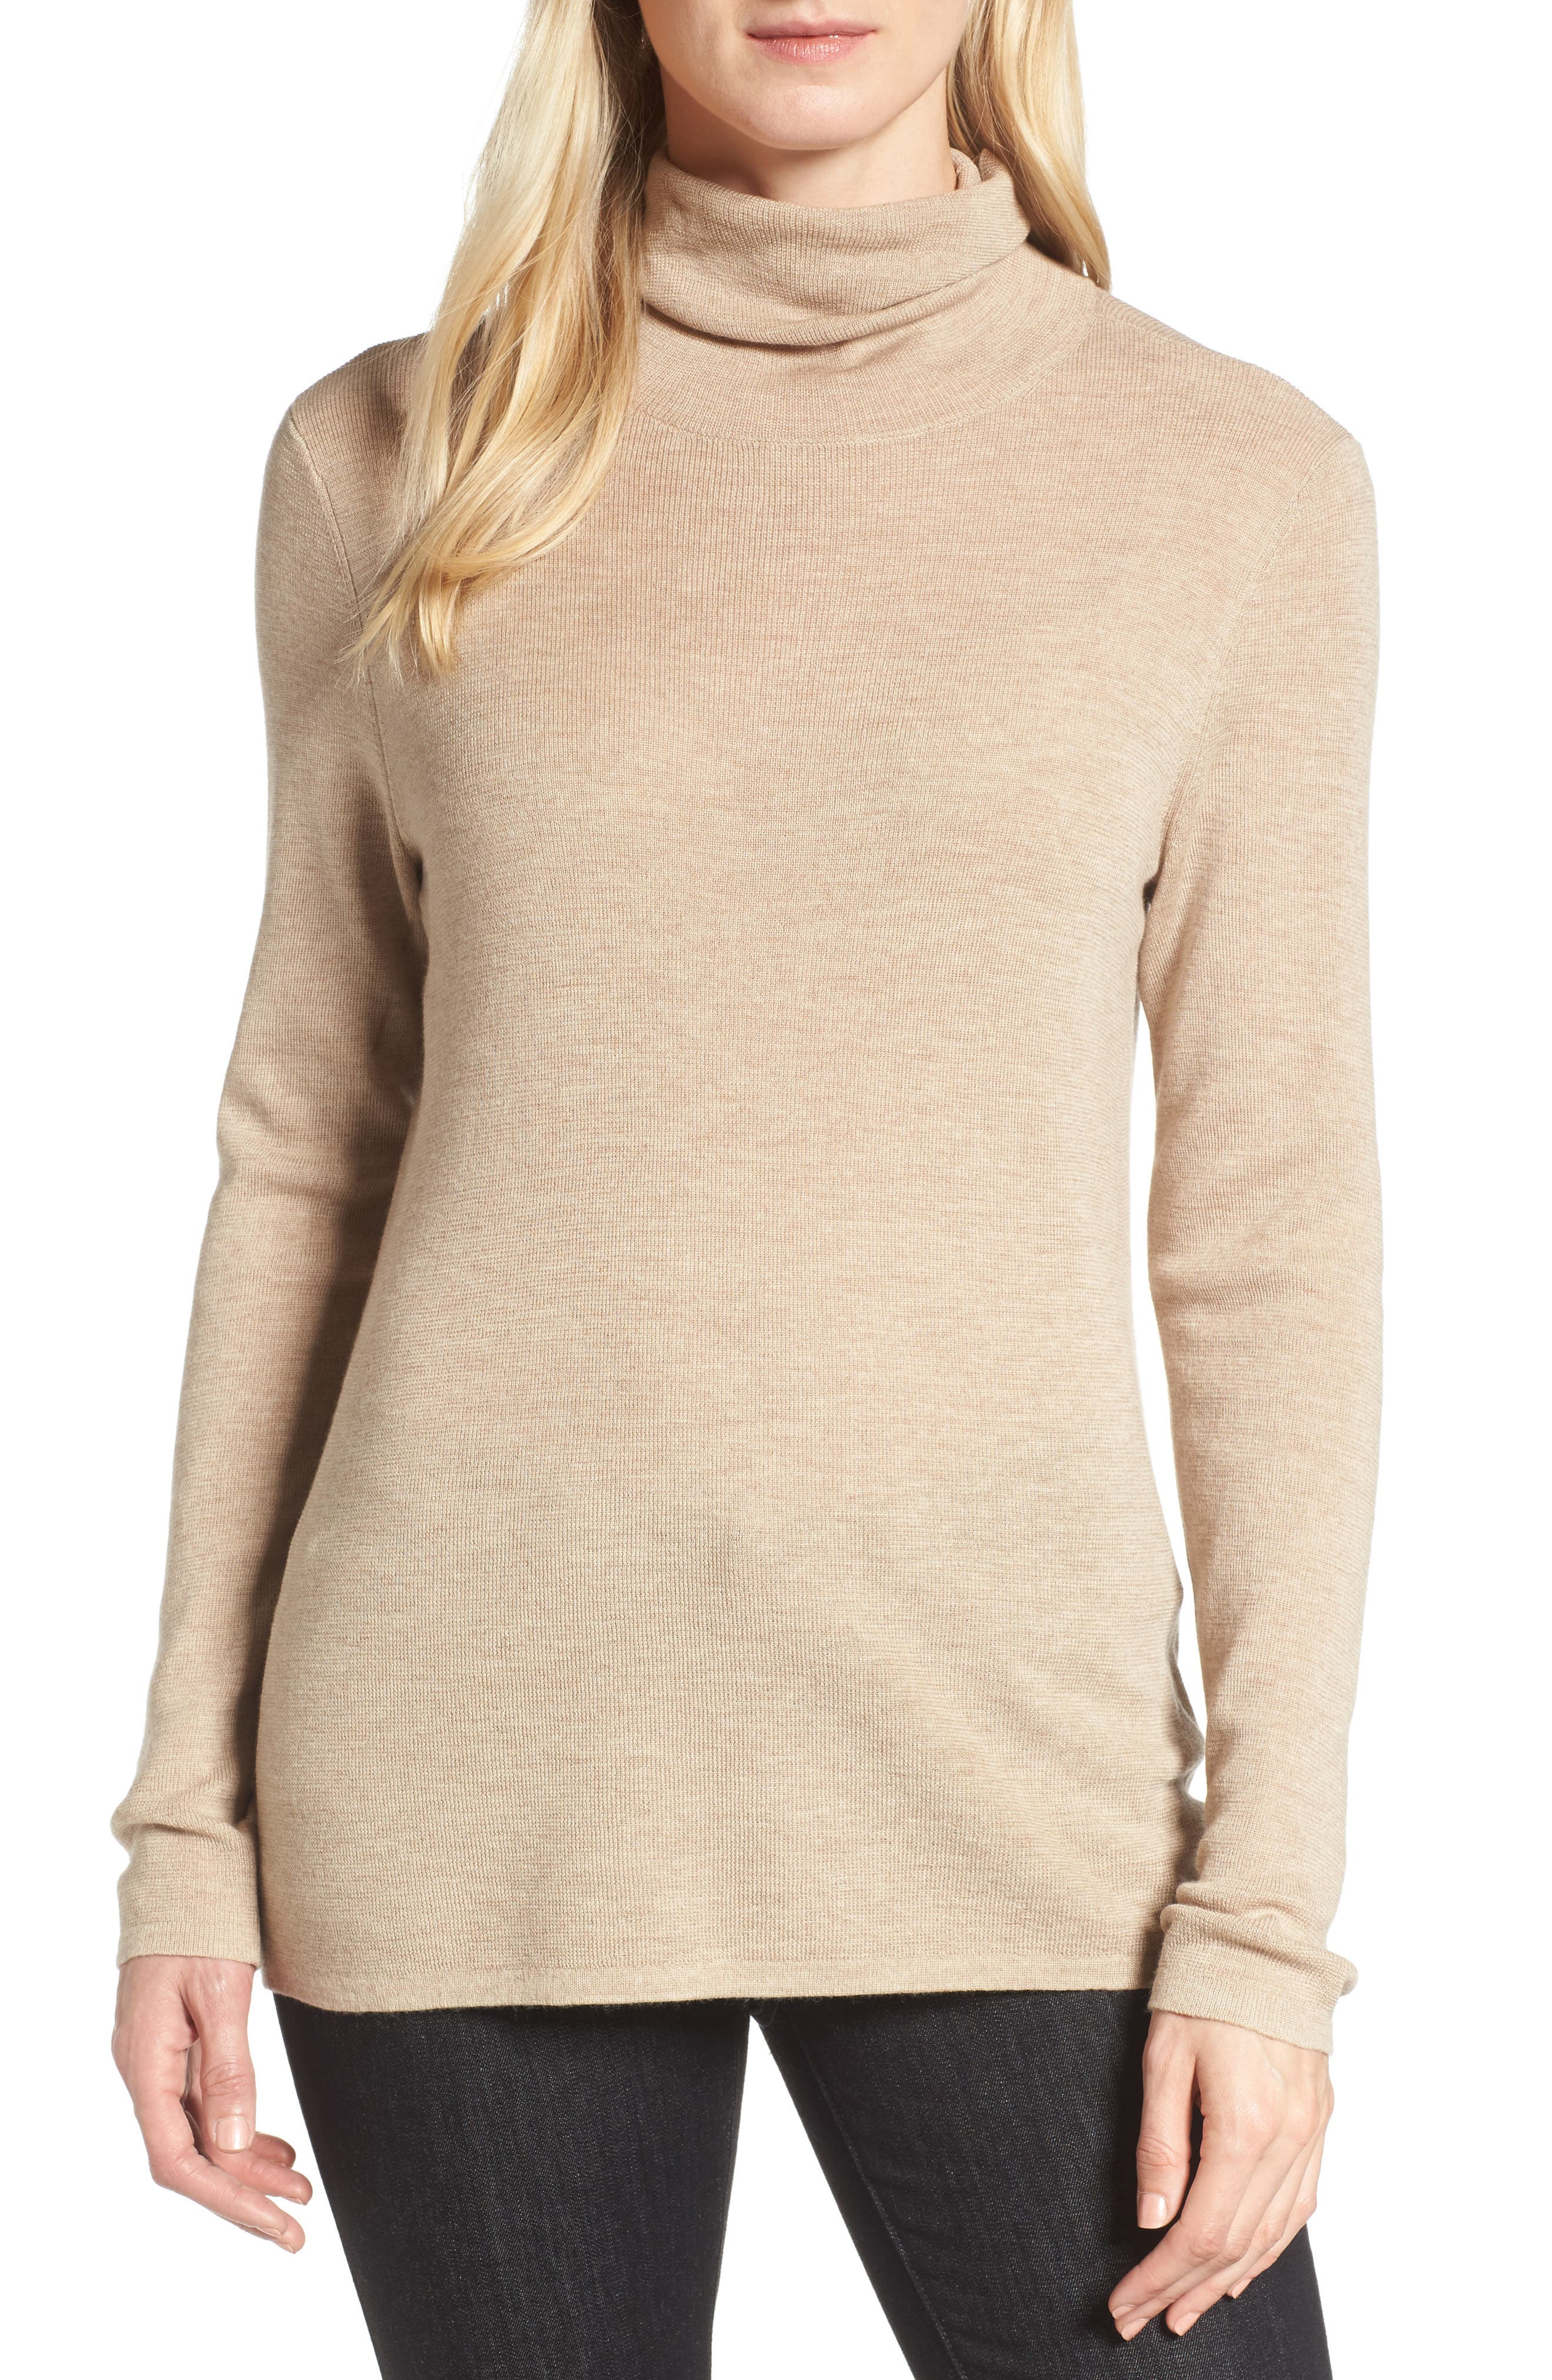 The Fisher Project Ultrafine Merino Turtleneck Sweater,                         Main,                         color, Maple Oat